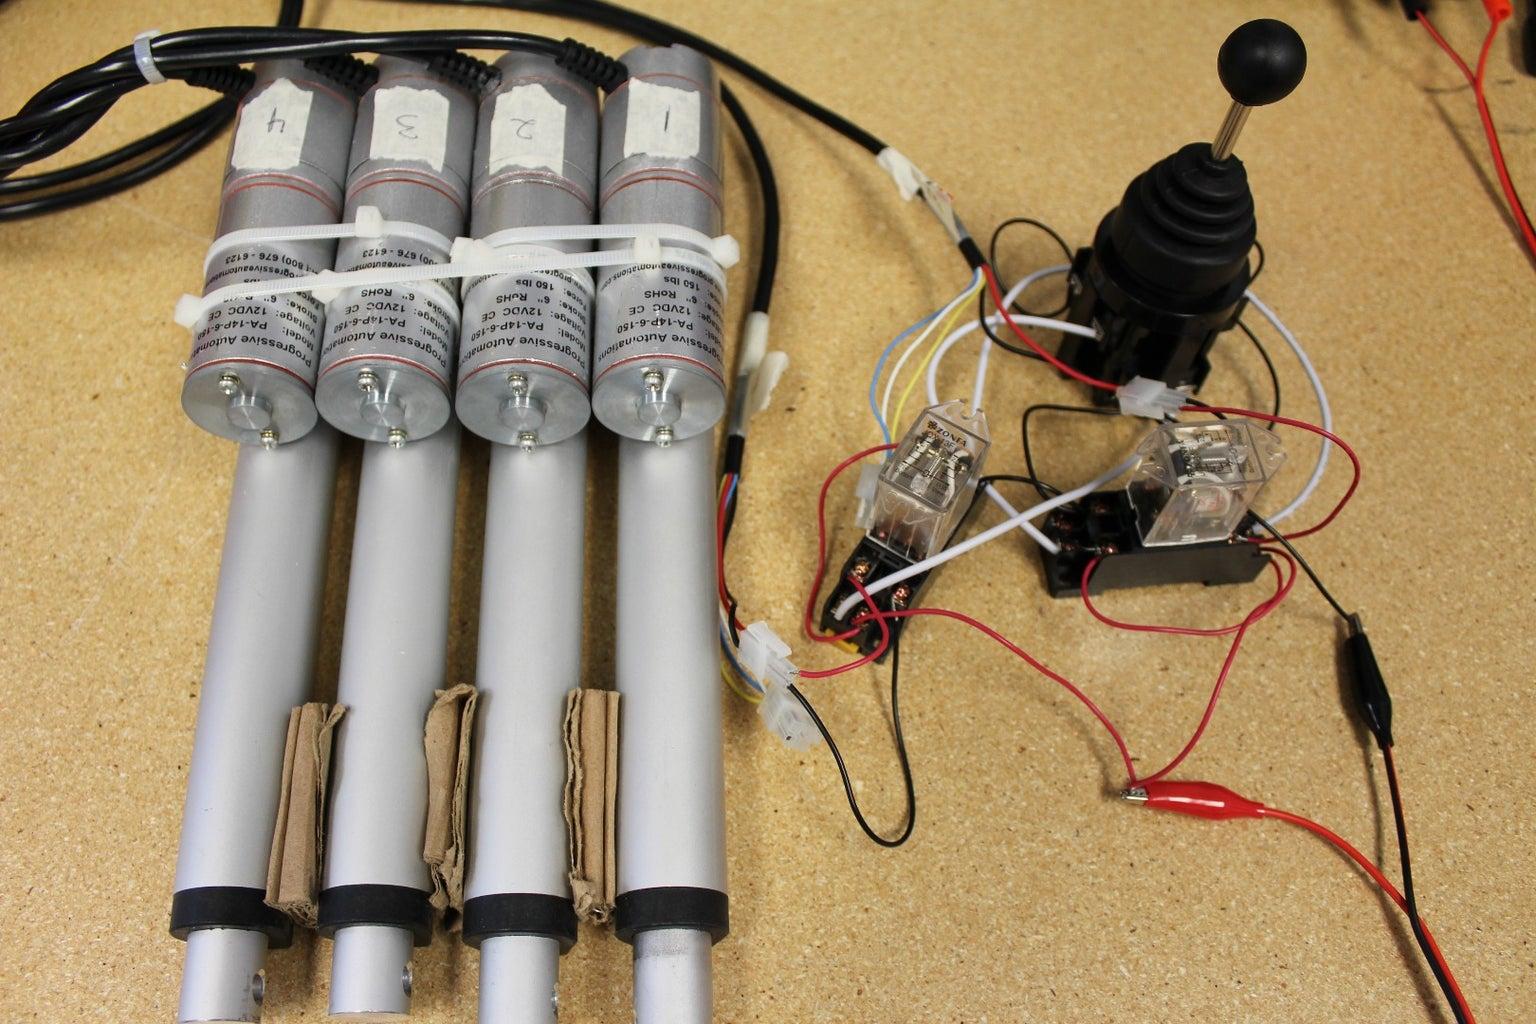 Wiring the Joystick